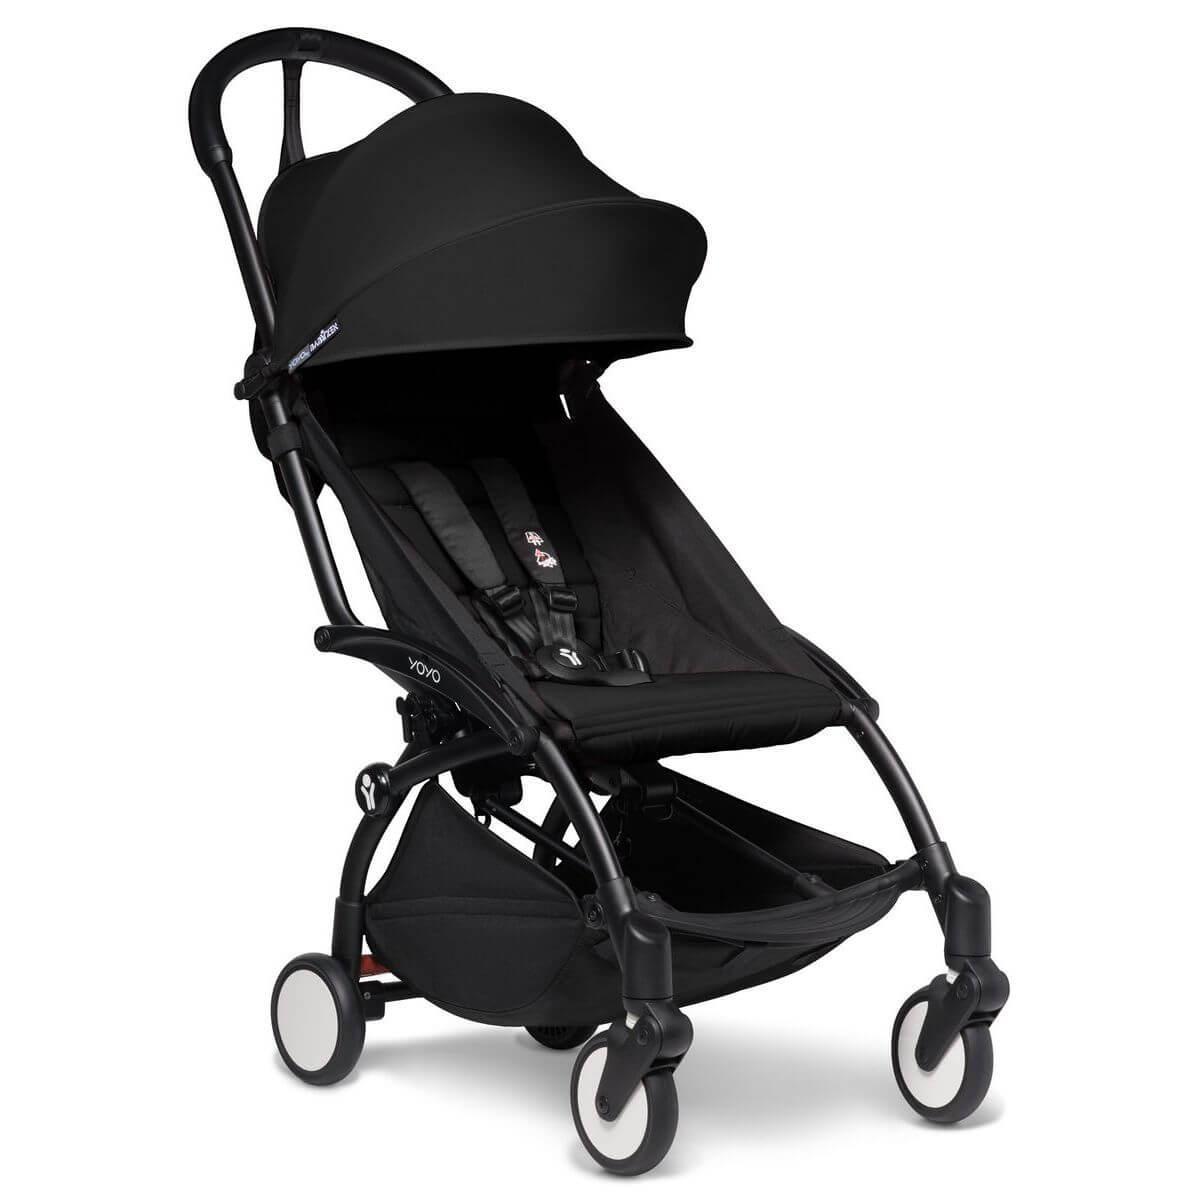 Kinderwagen BABYZEN YOYO² 6+ schwarz-schwarz